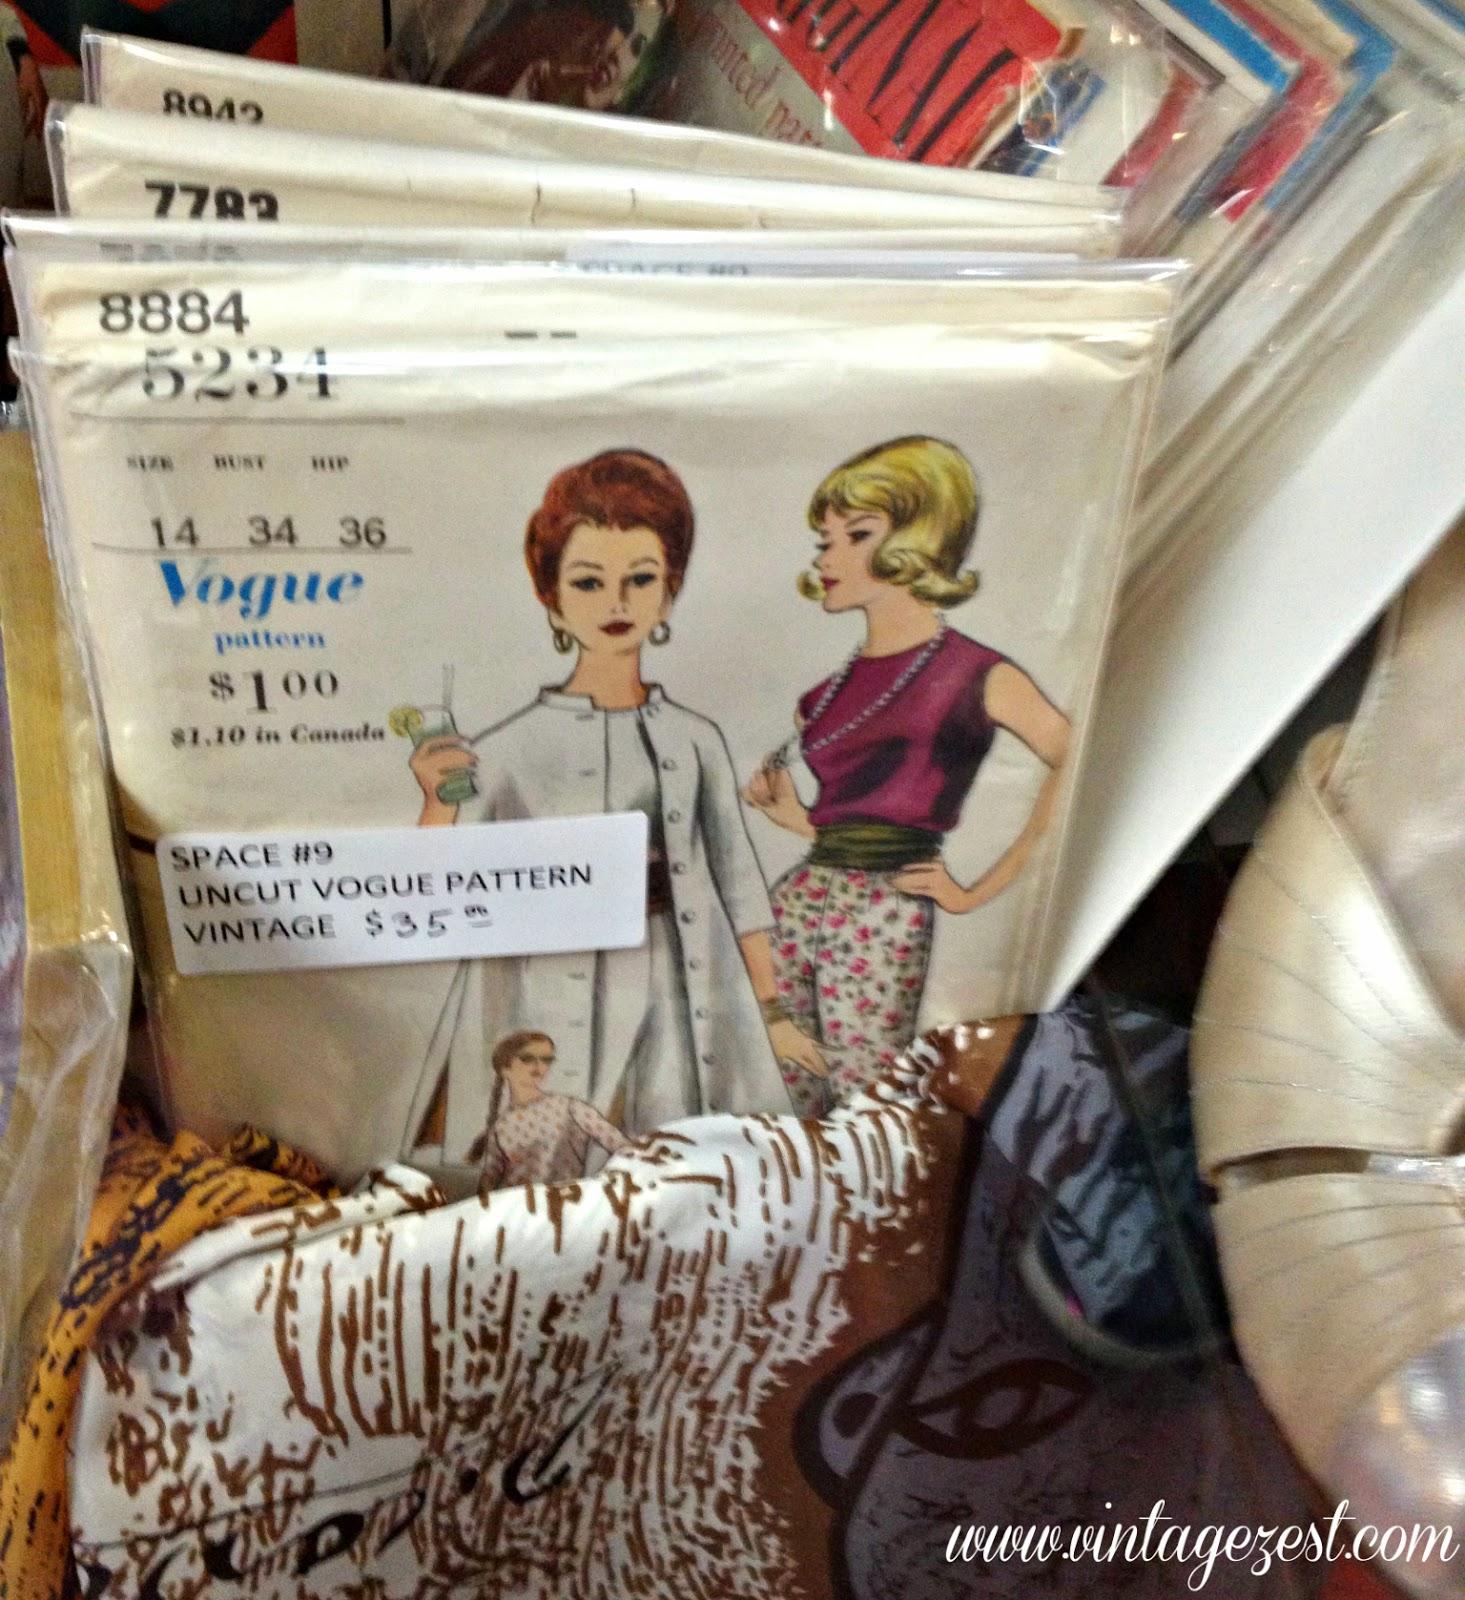 Weekly Wrap-Up on Diane's Vintage Zest!